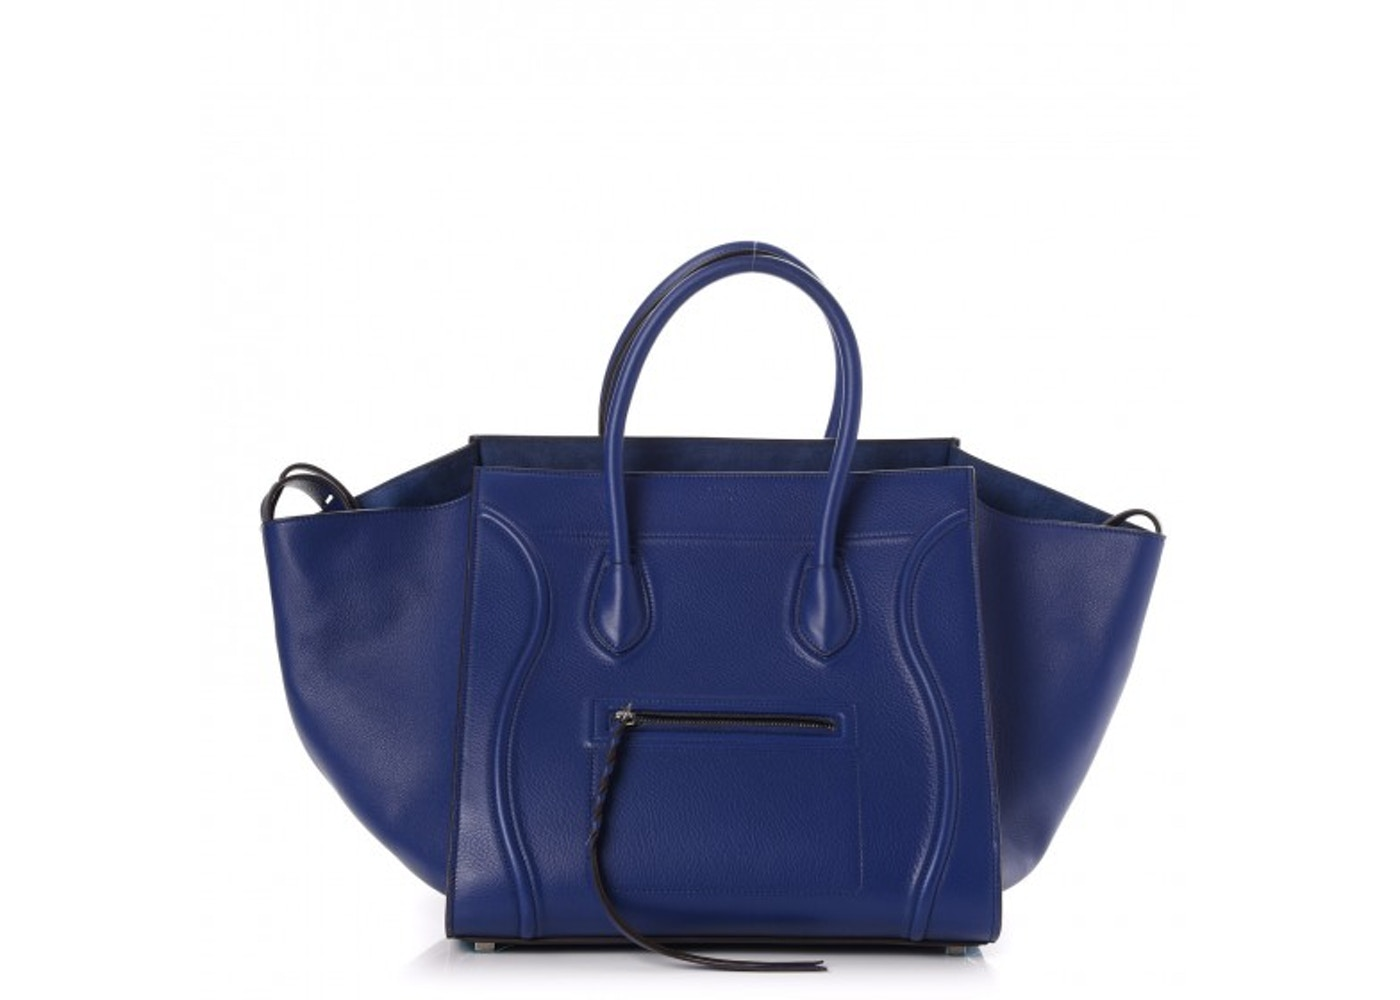 669b556754 Buy   Sell Celine Handbags - Price Premium